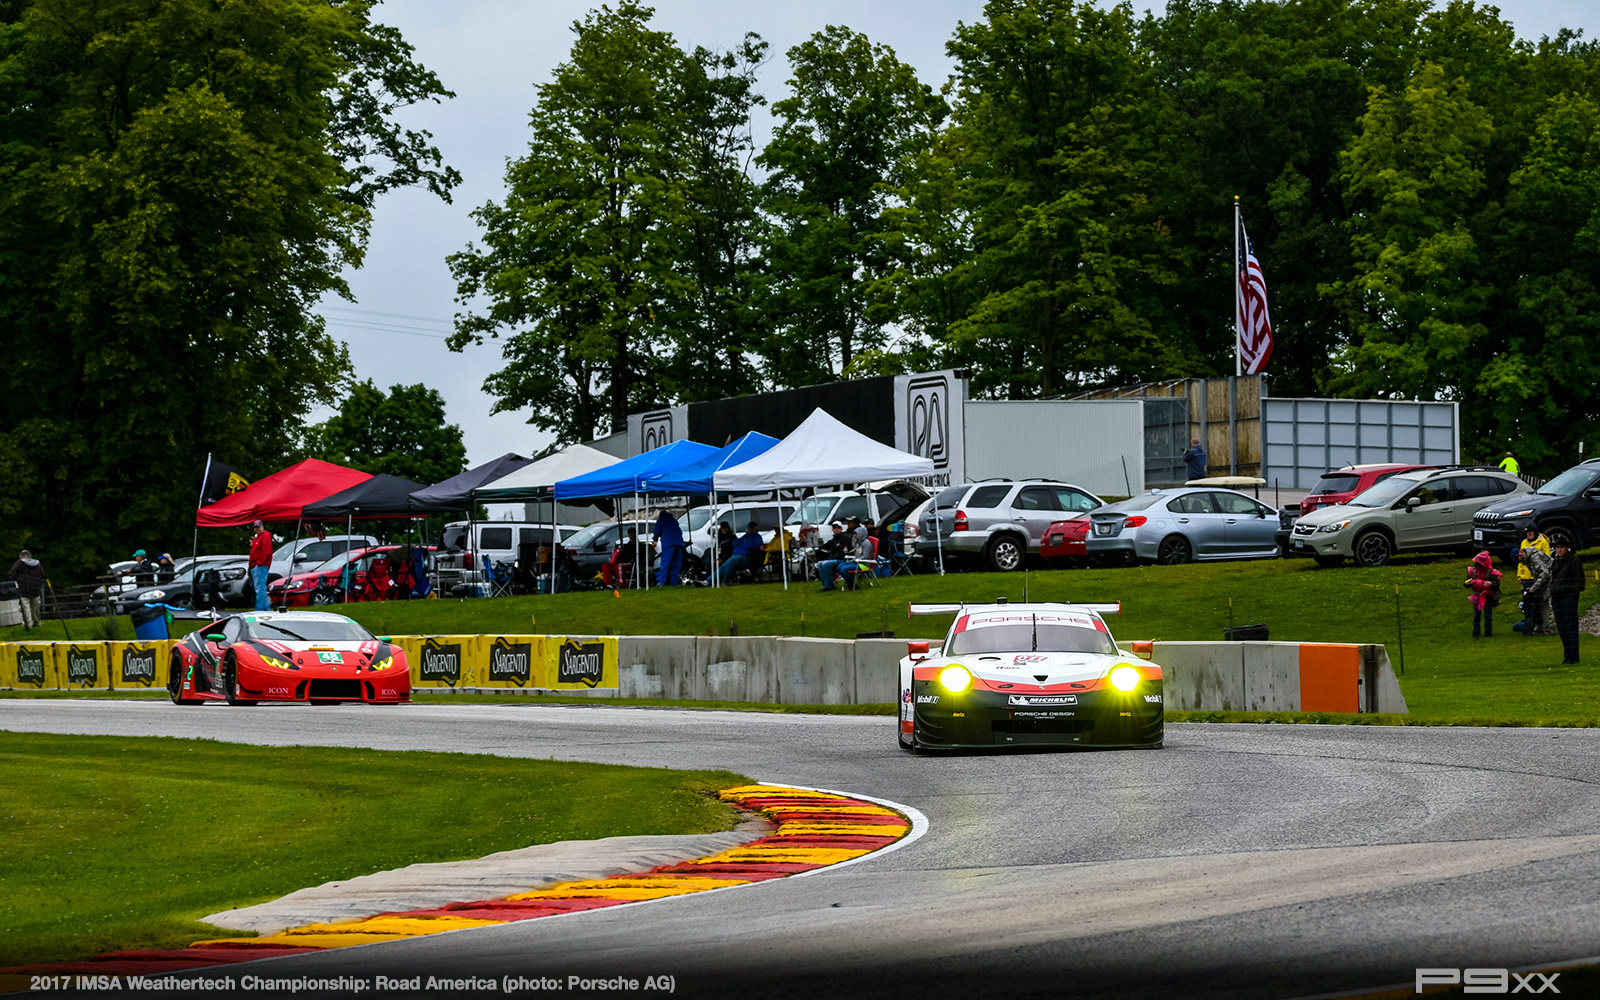 2017-IMSA-Weathertech-Road-America-Porsche-300